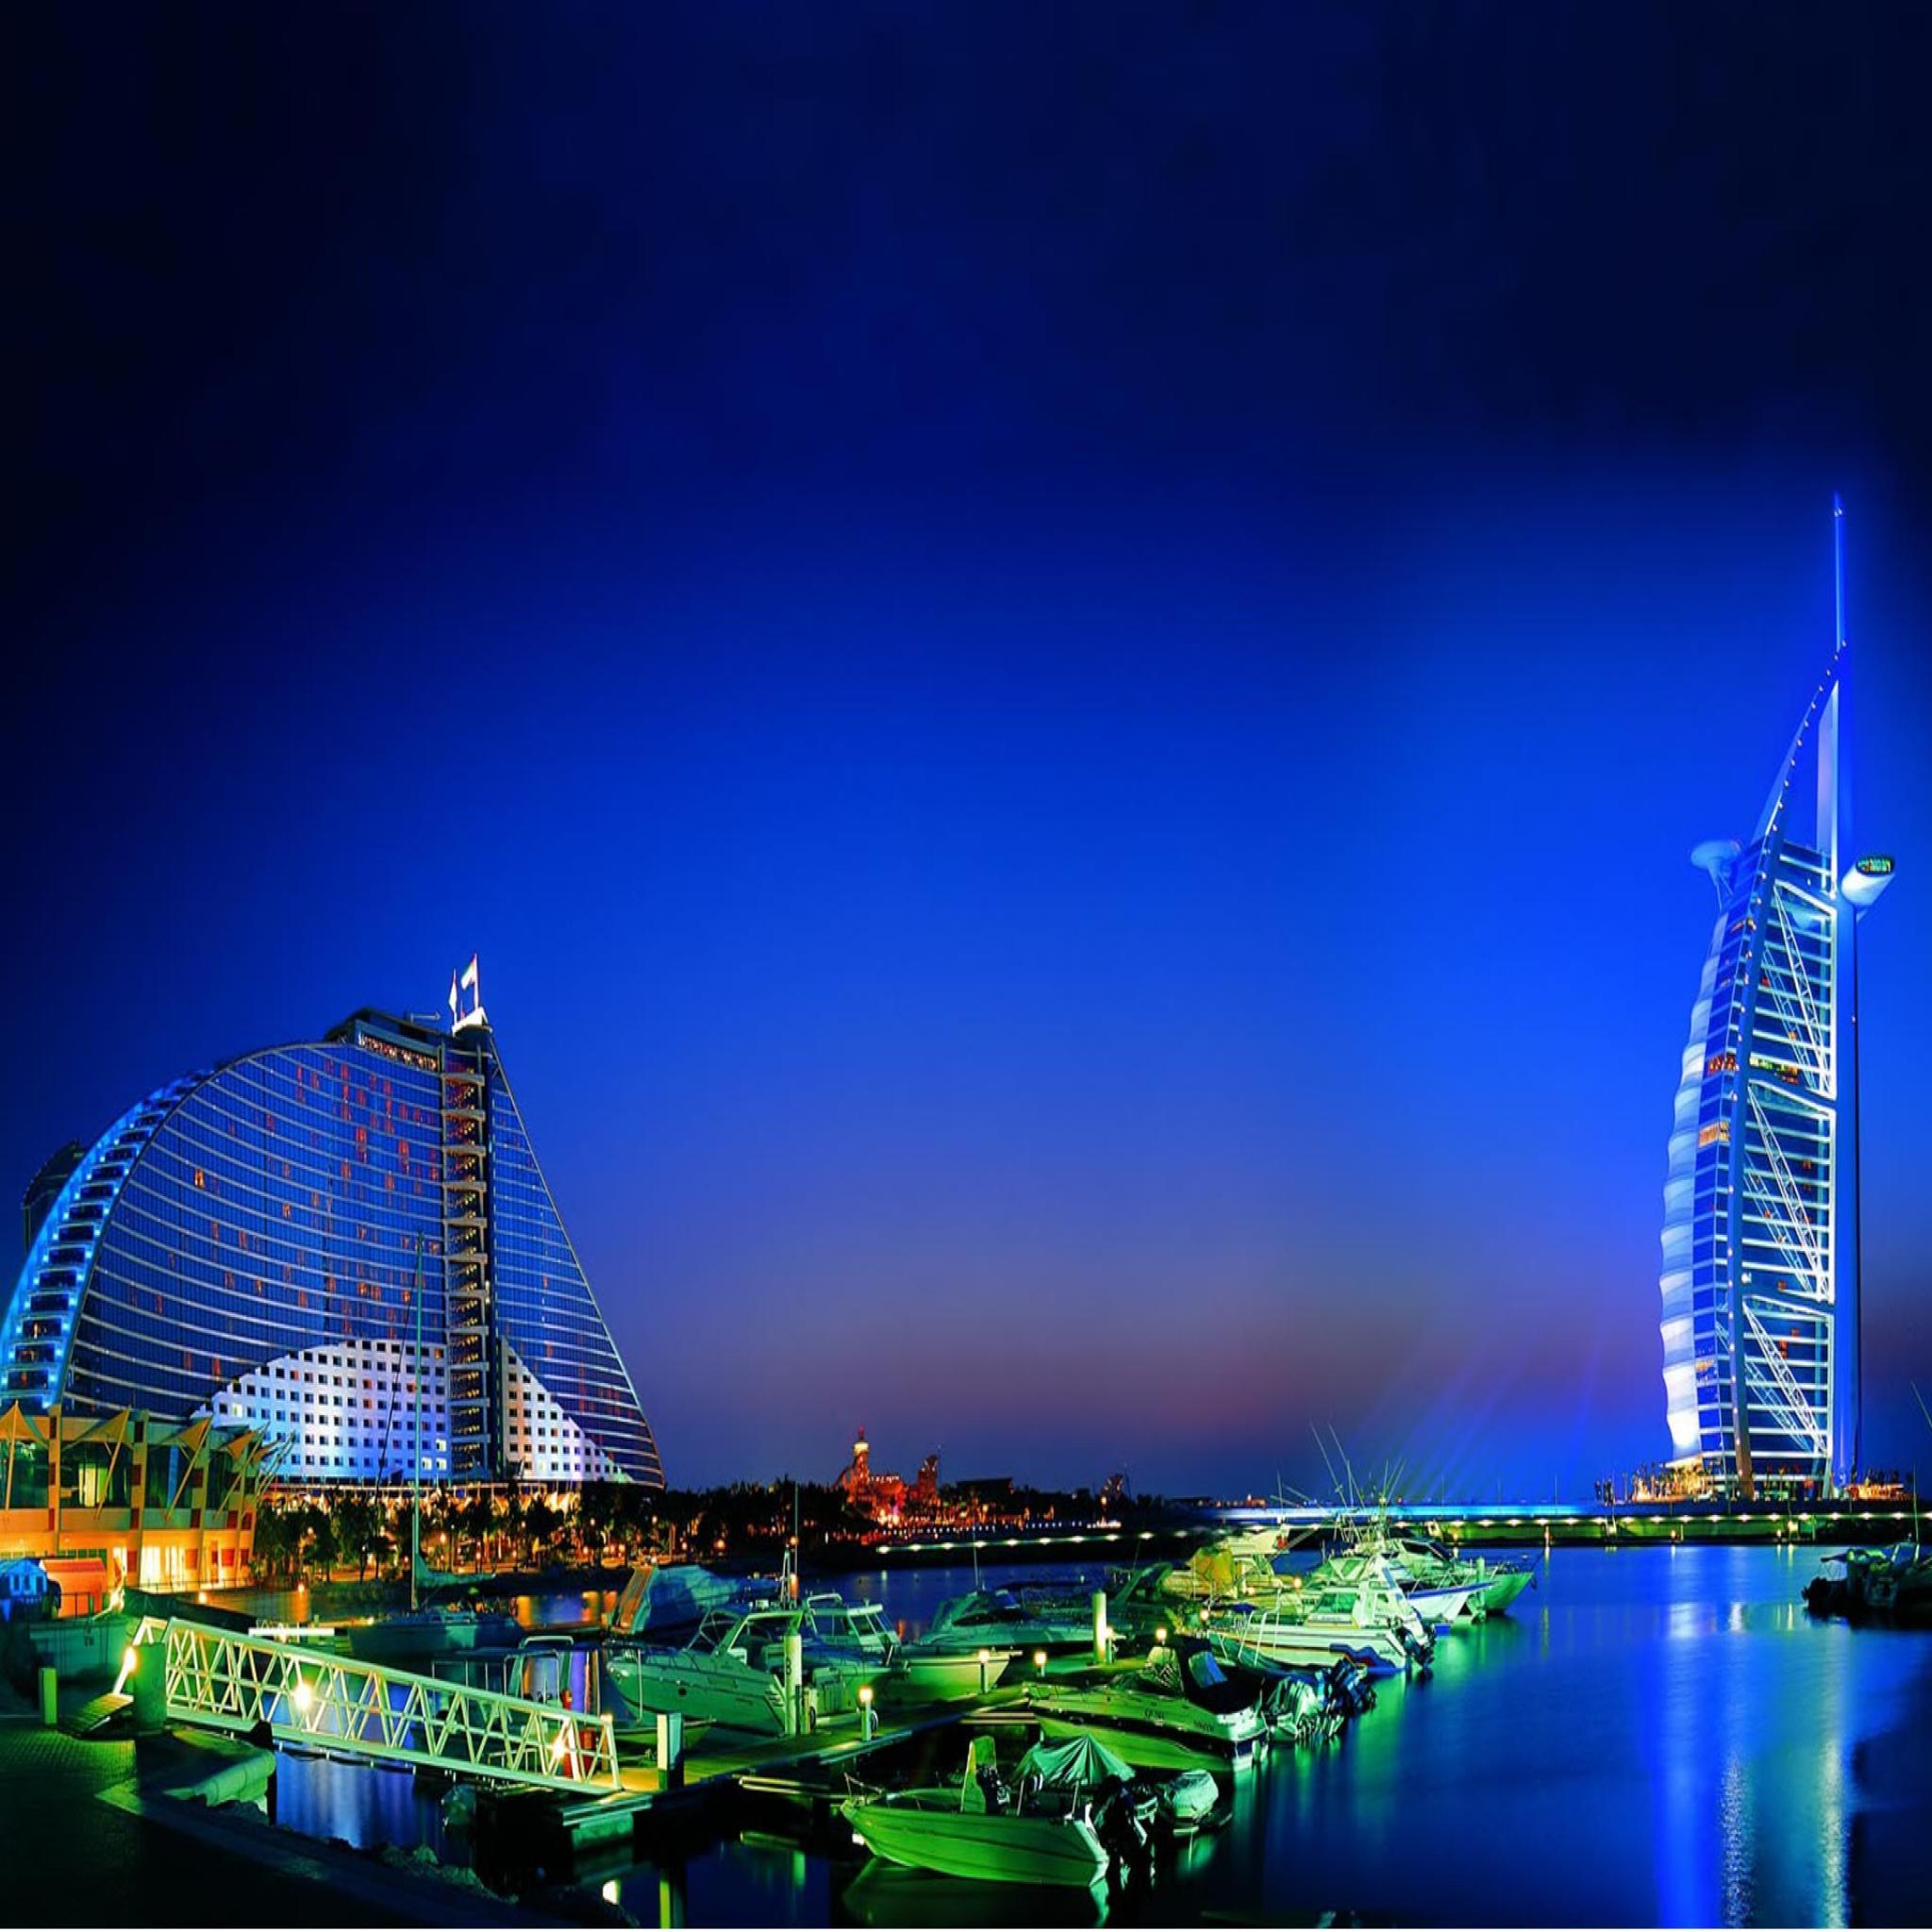 Dubai Nightlife Desktop 2048x2048 Wallpapers HD Wallpapers 2048x2048